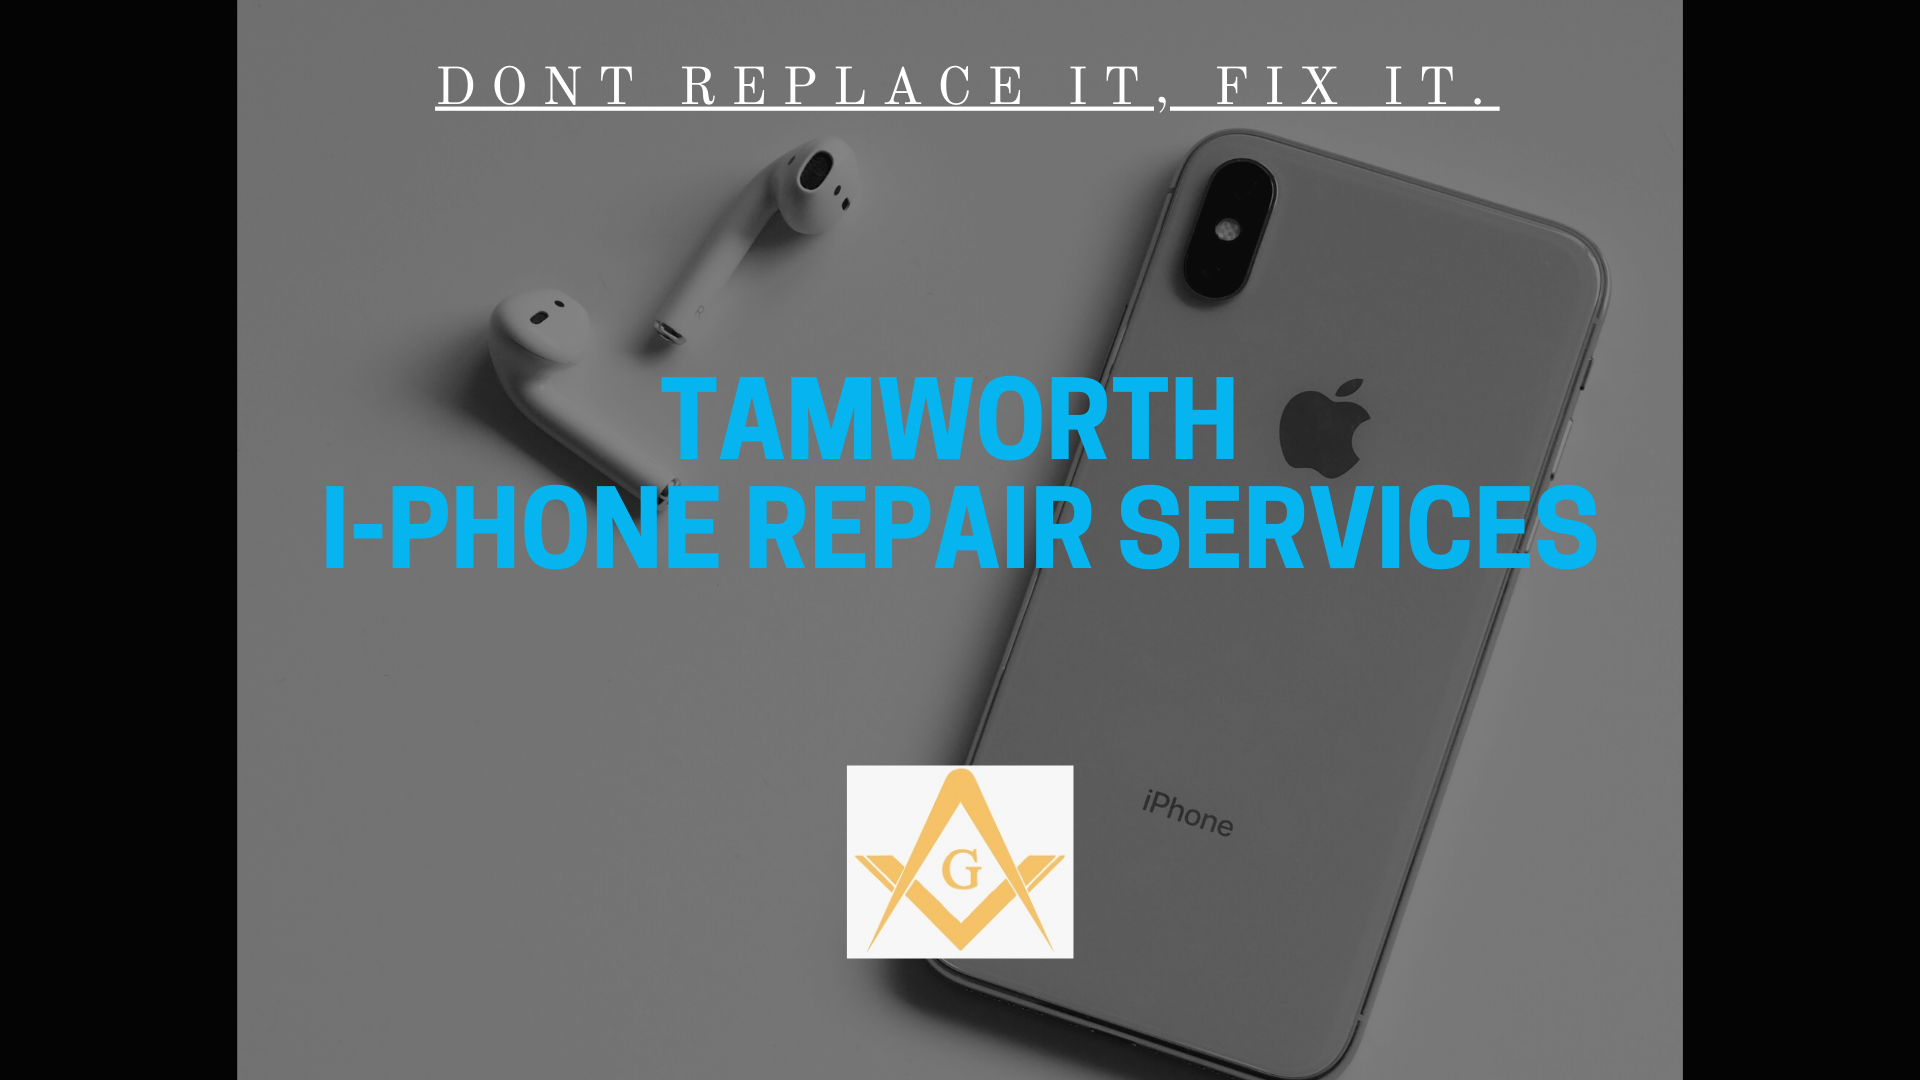 Tamworth iPhone Repair Services